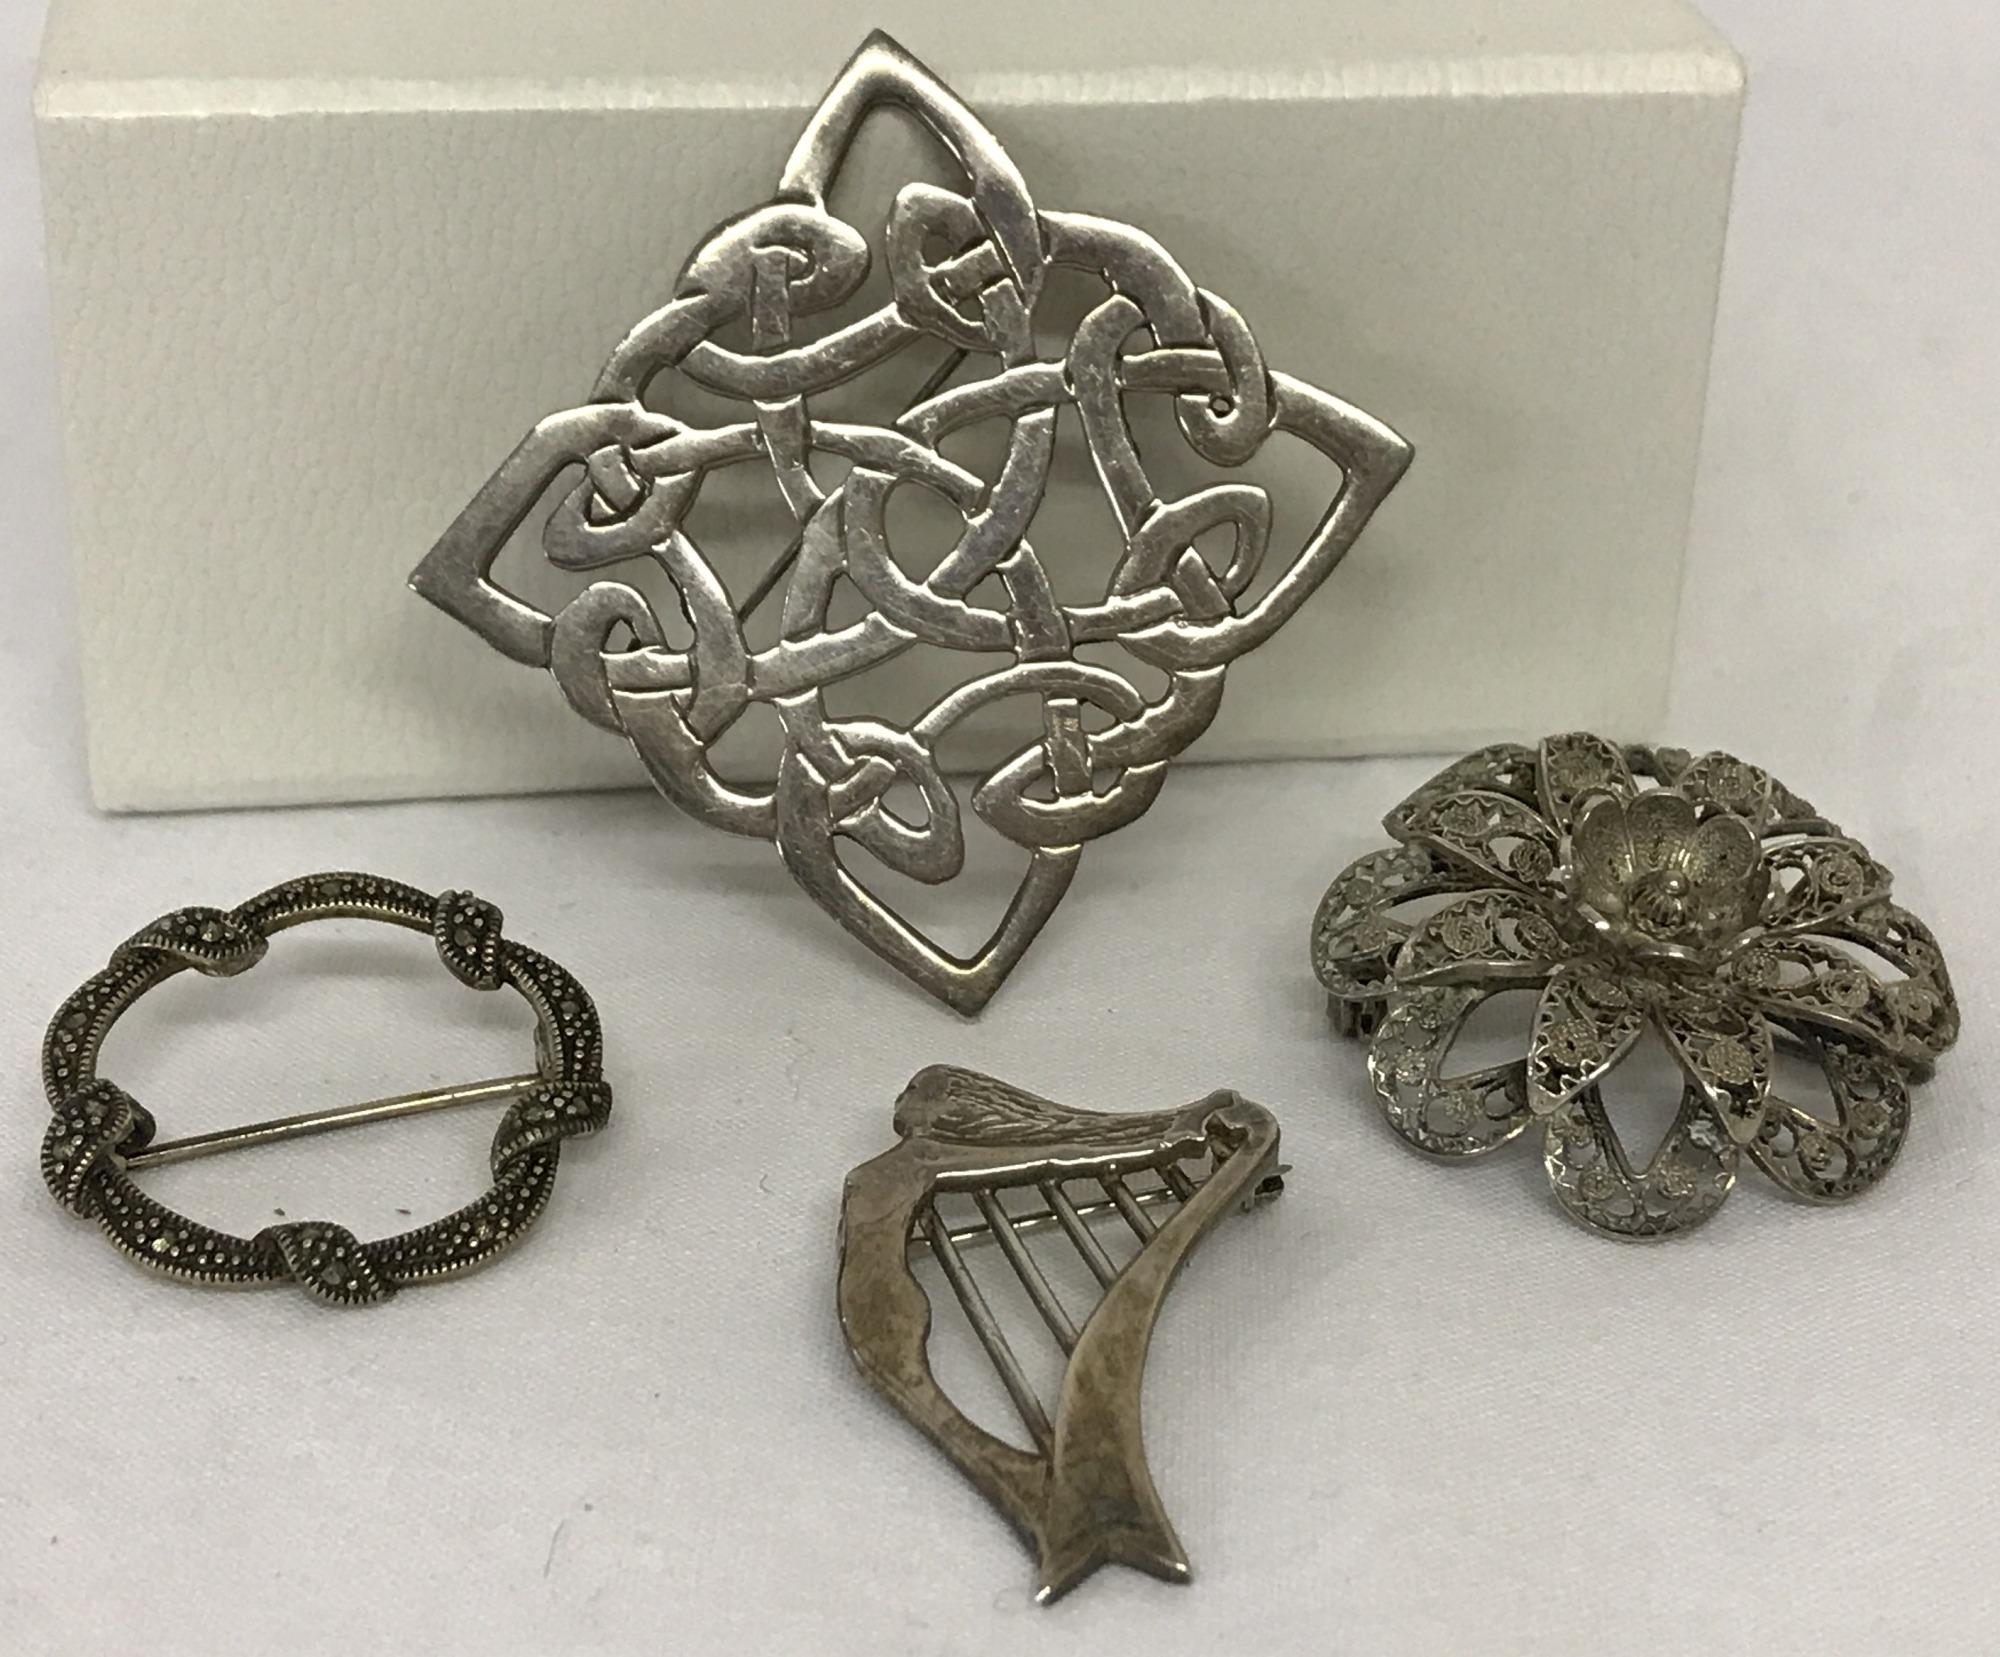 Lot 34 - A large silver Celtic knot brooch hallmarked London 1995.